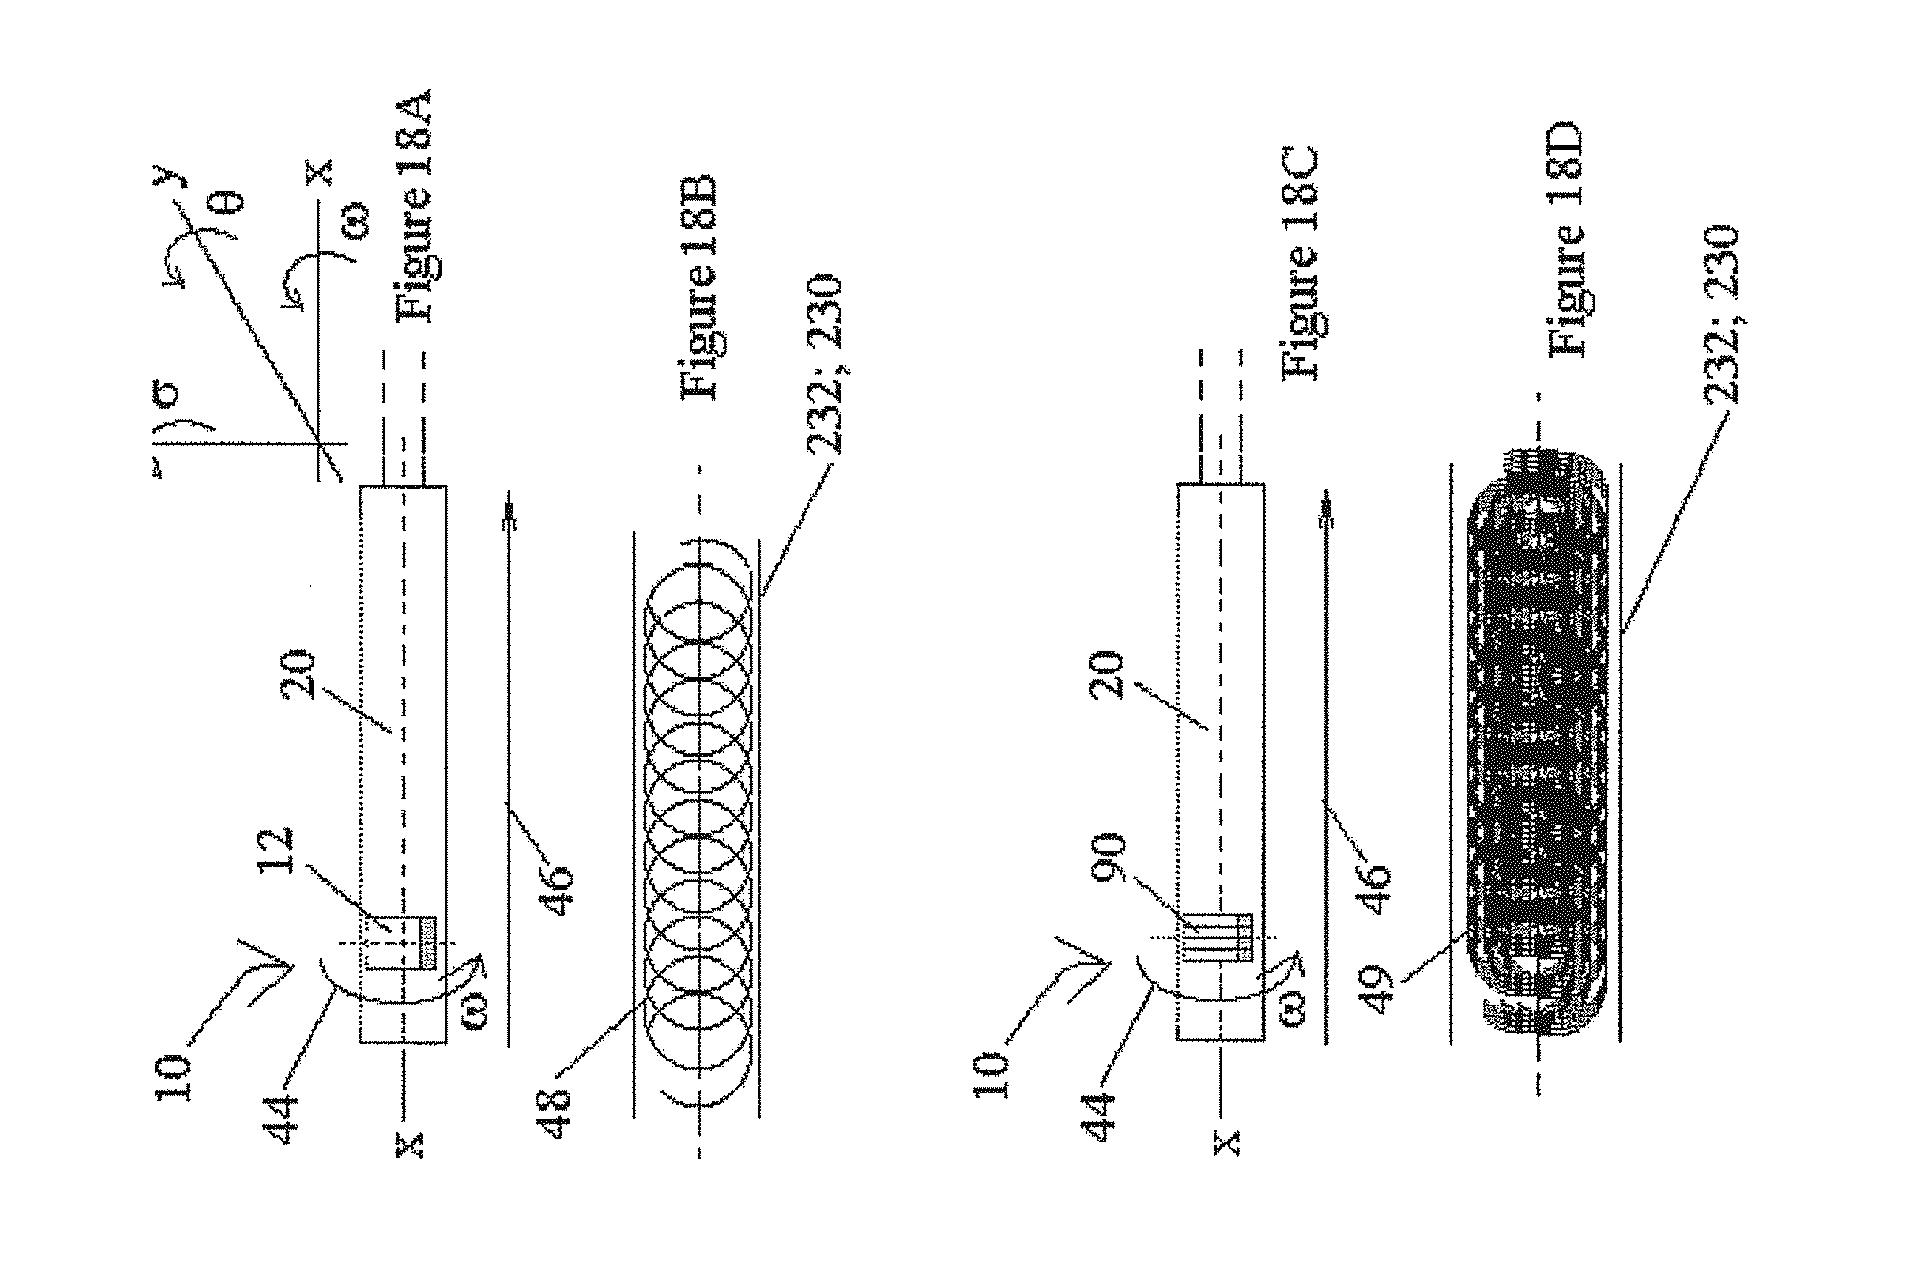 Patent US 9,943,278 B2